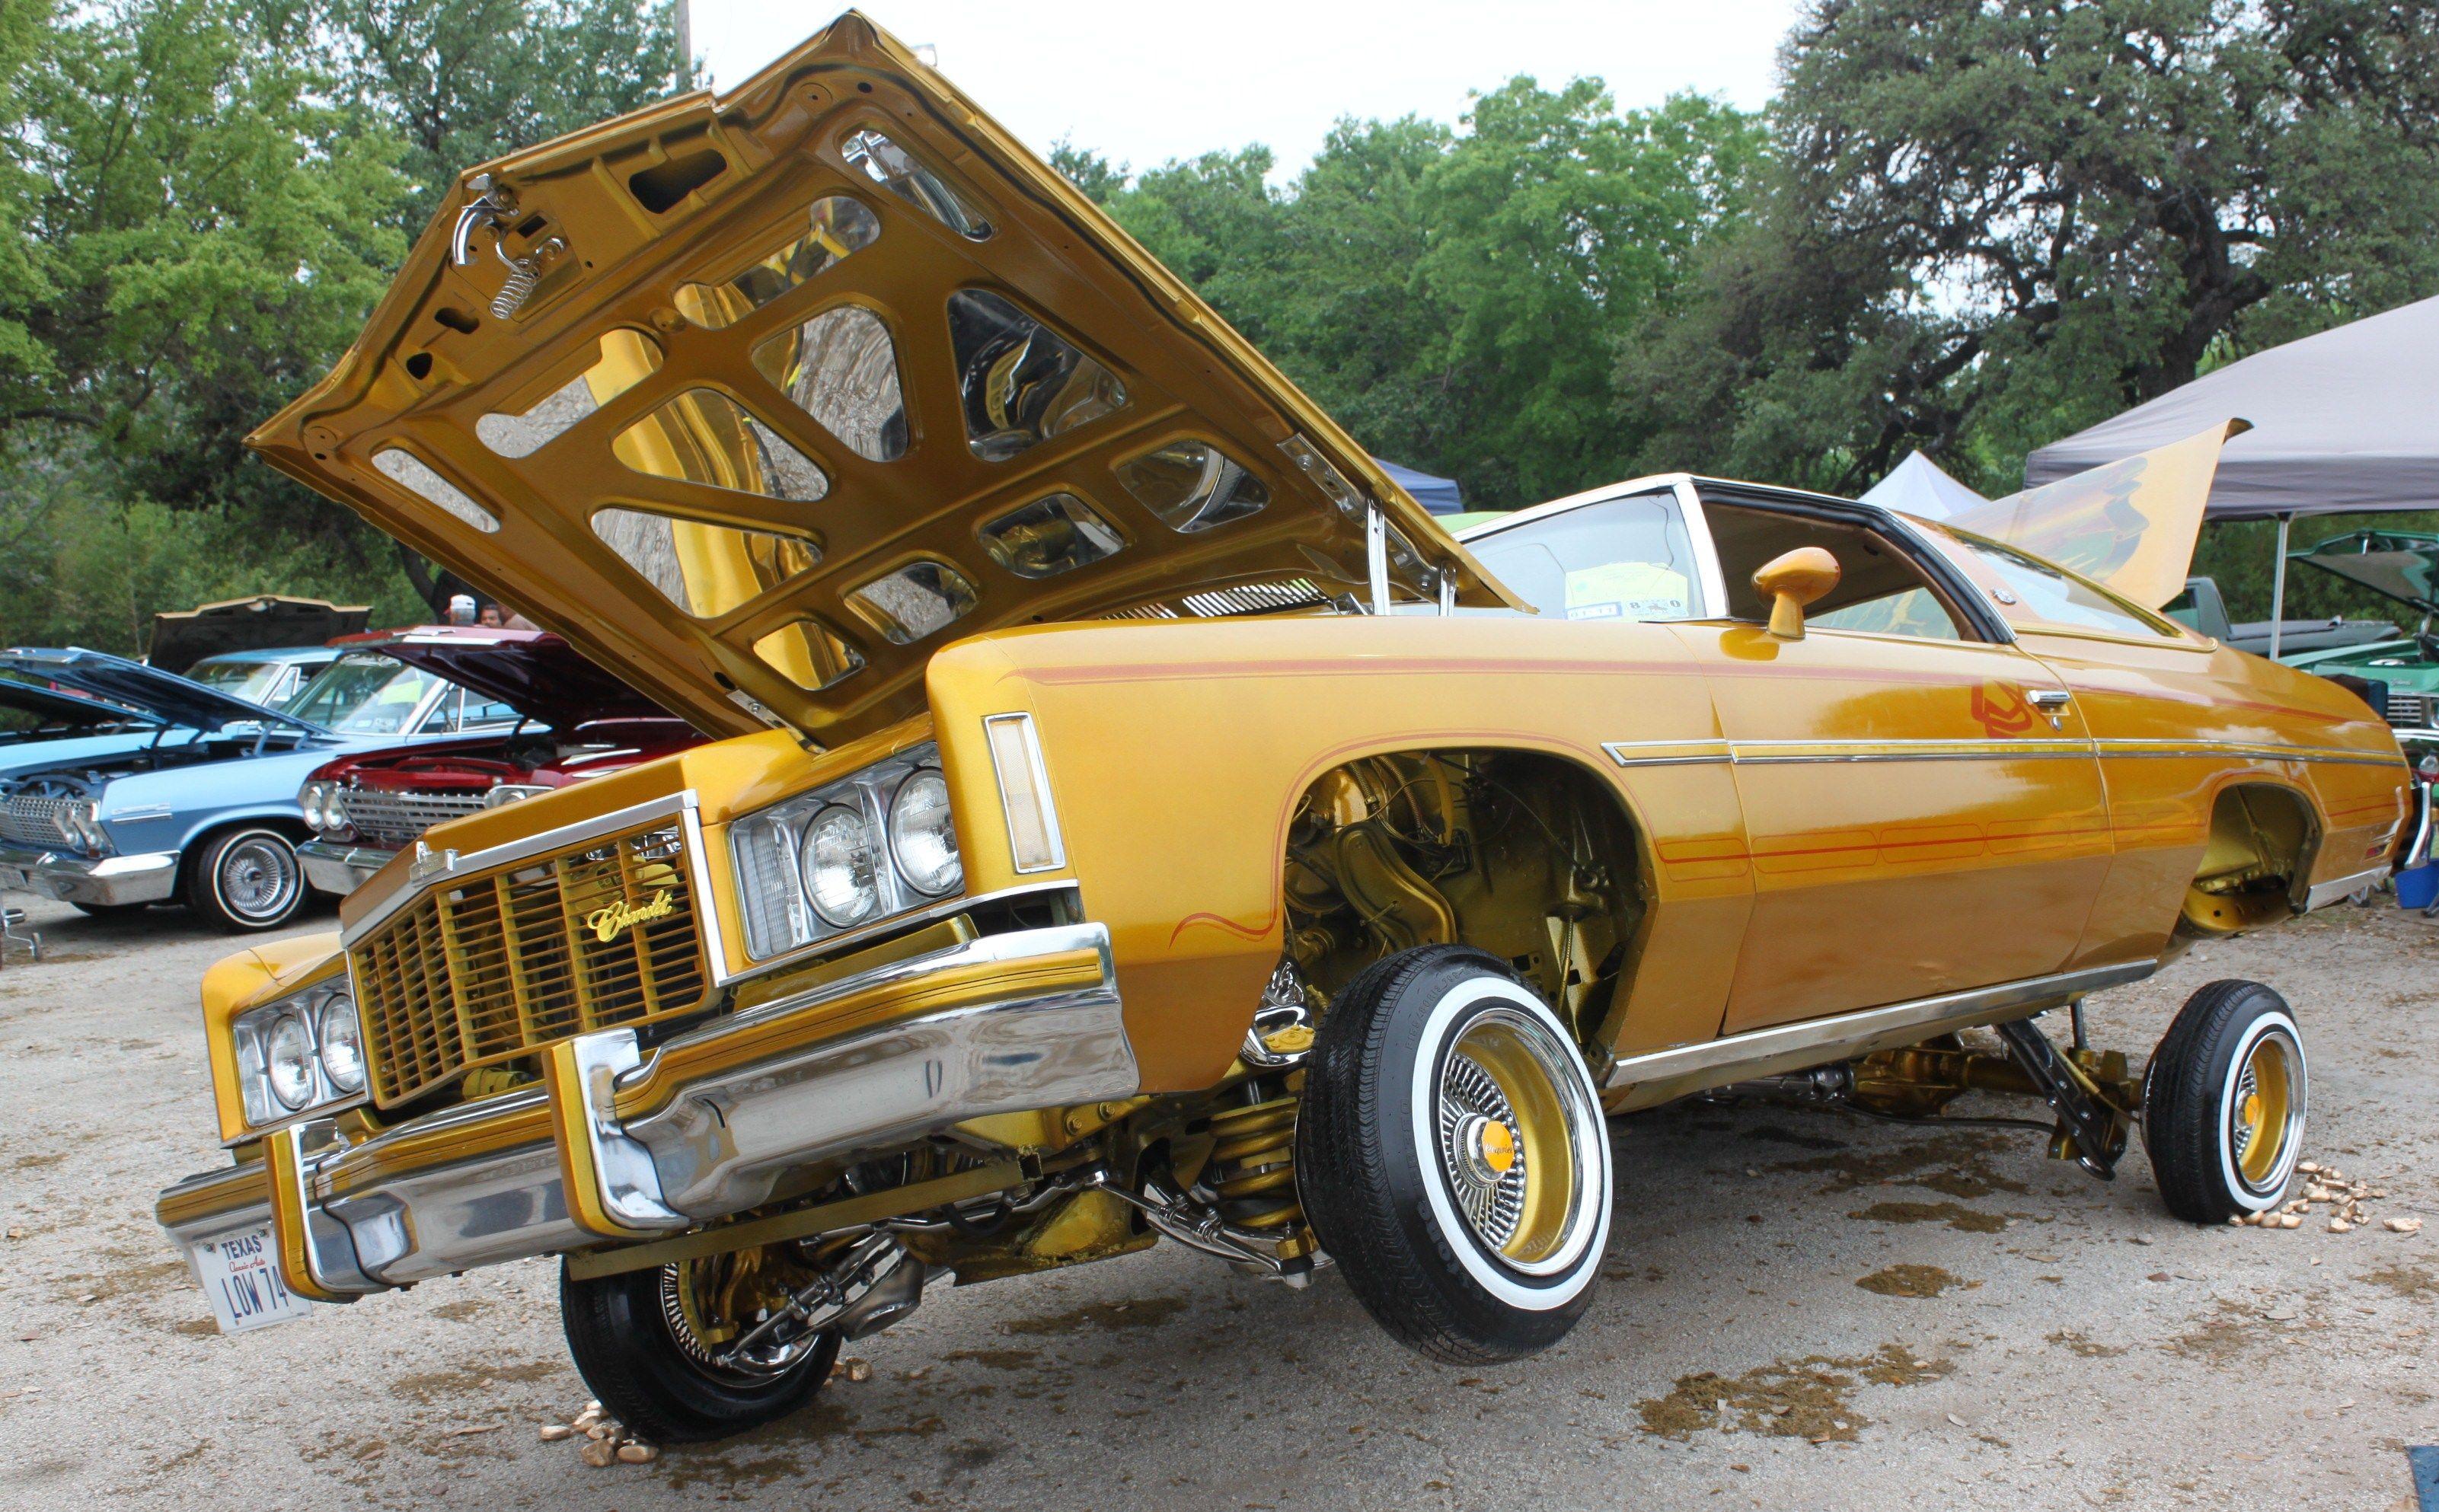 Gold Lowrider Hydraulic Cars Lowriders Lowrider Cars